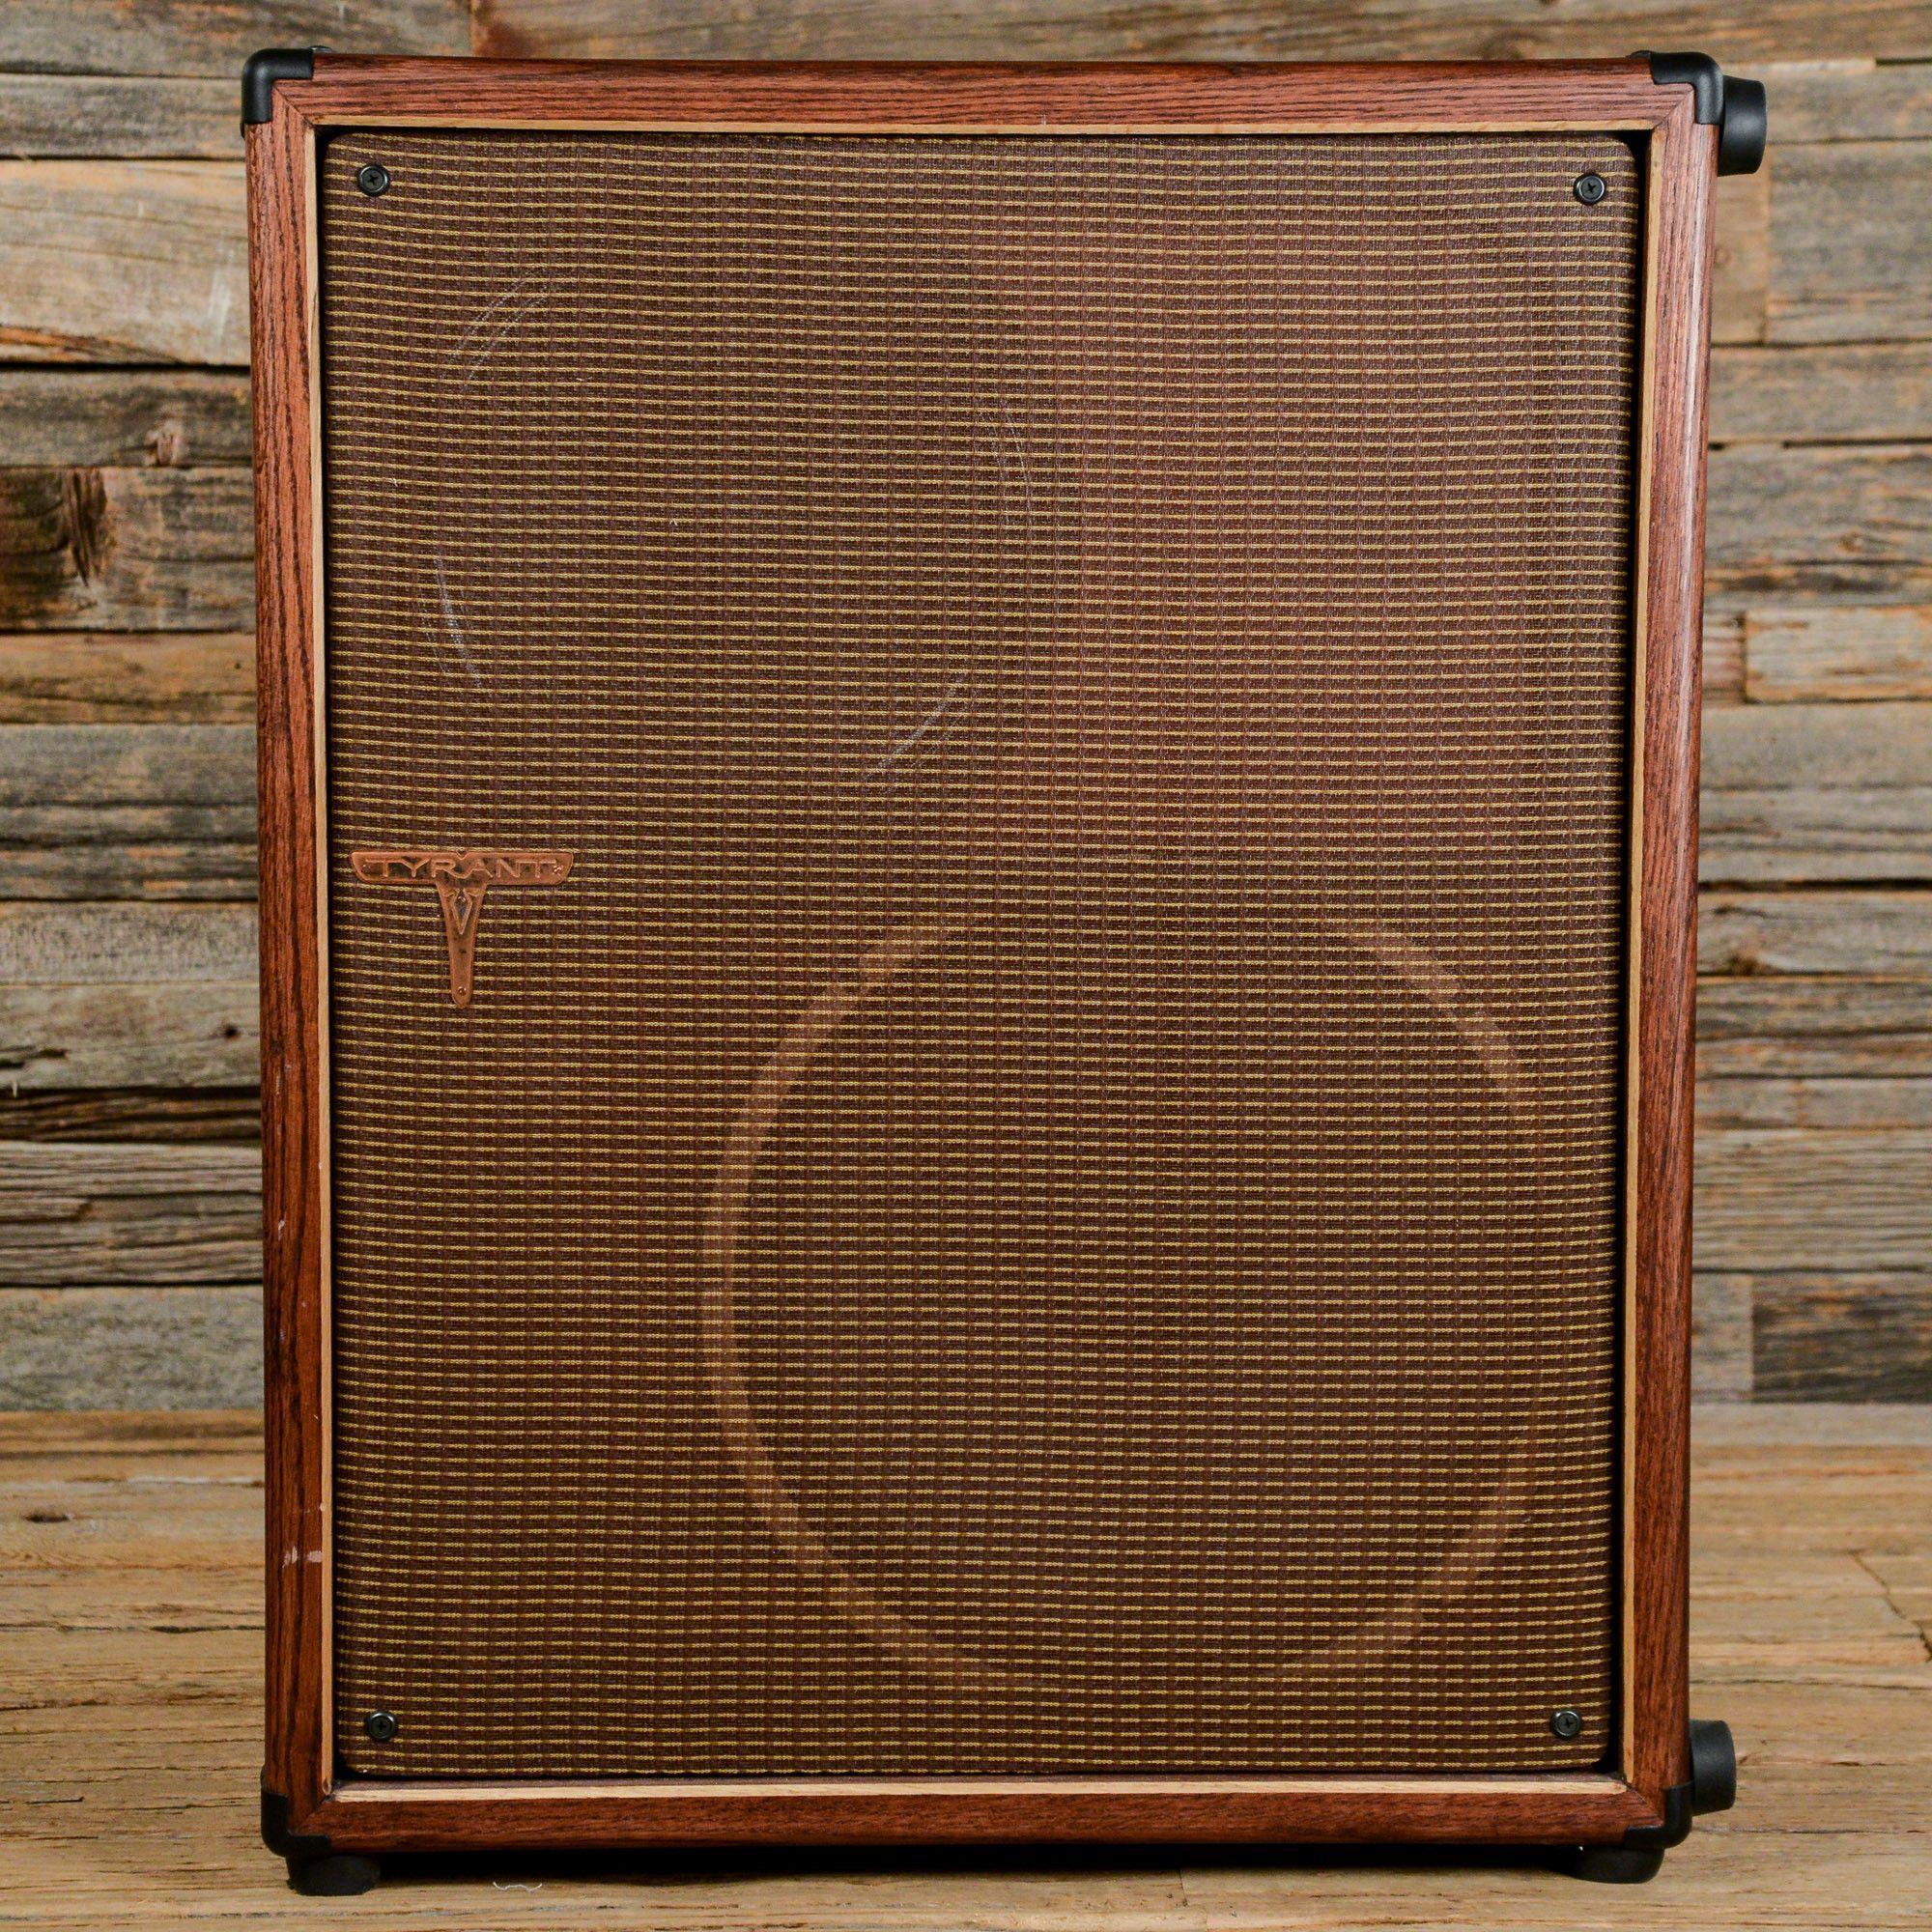 1x15 Guitar Cabinet Fender Deluxe Molded Jaguar Jazzmaster Case Black Products